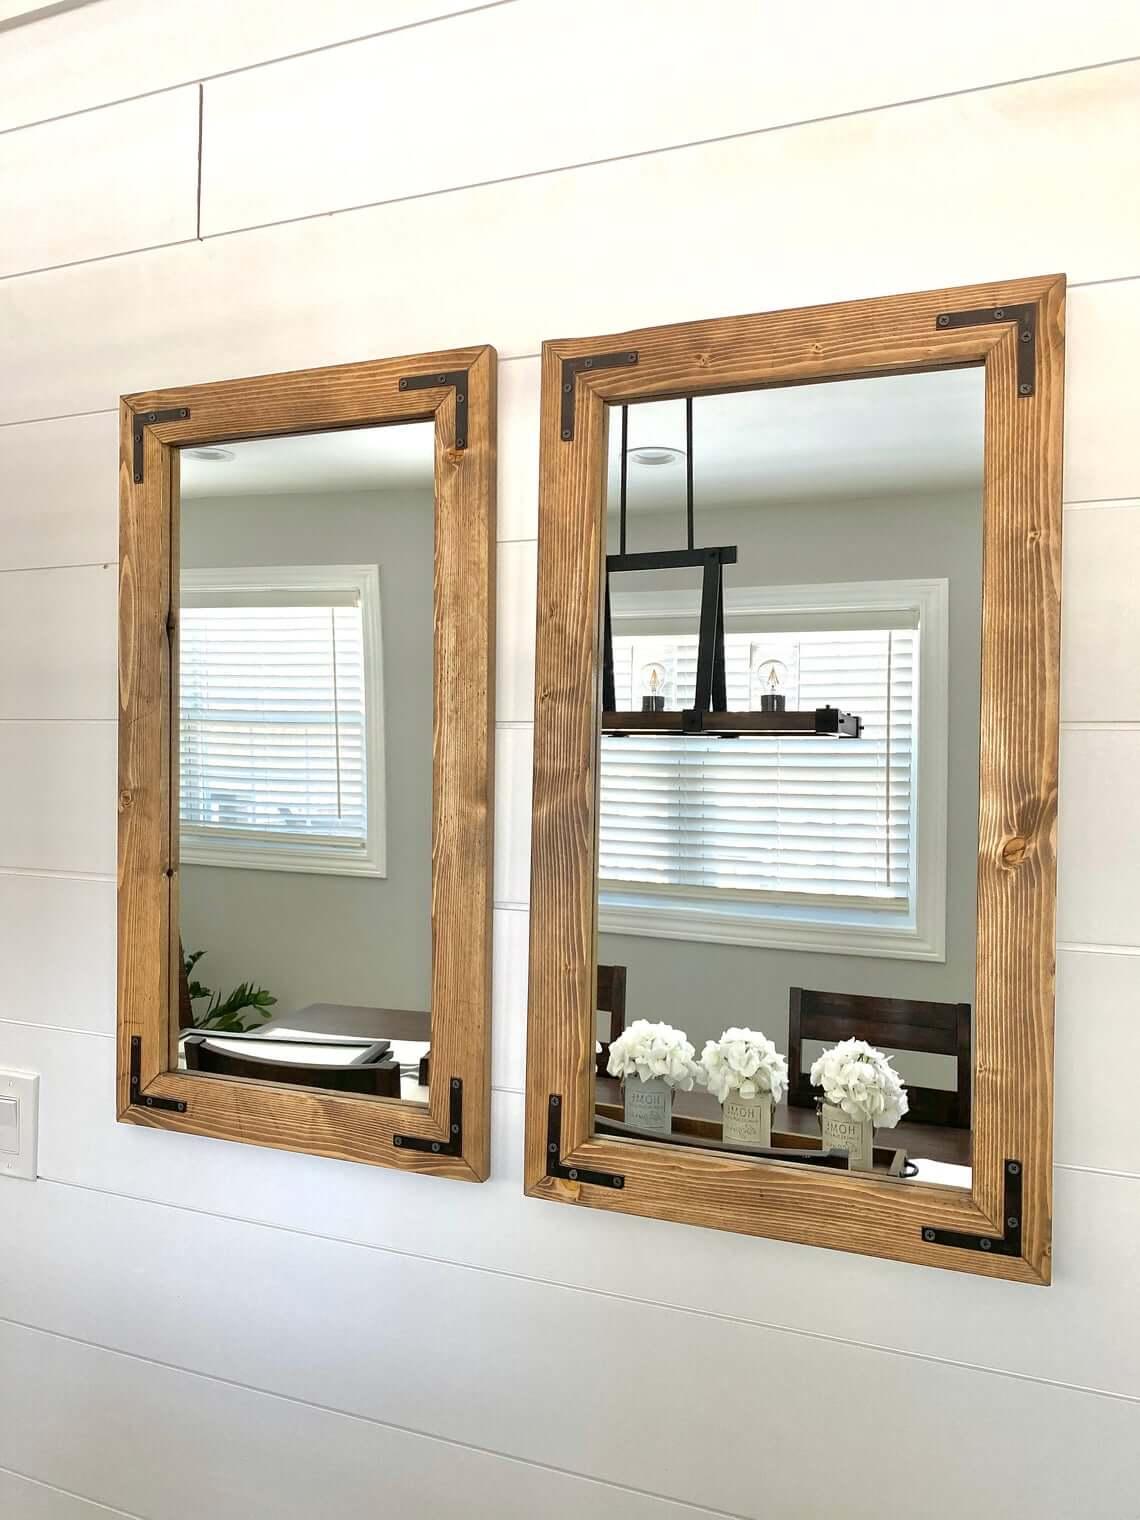 Double Your Fun Wood Farmhouse Mirror Duo